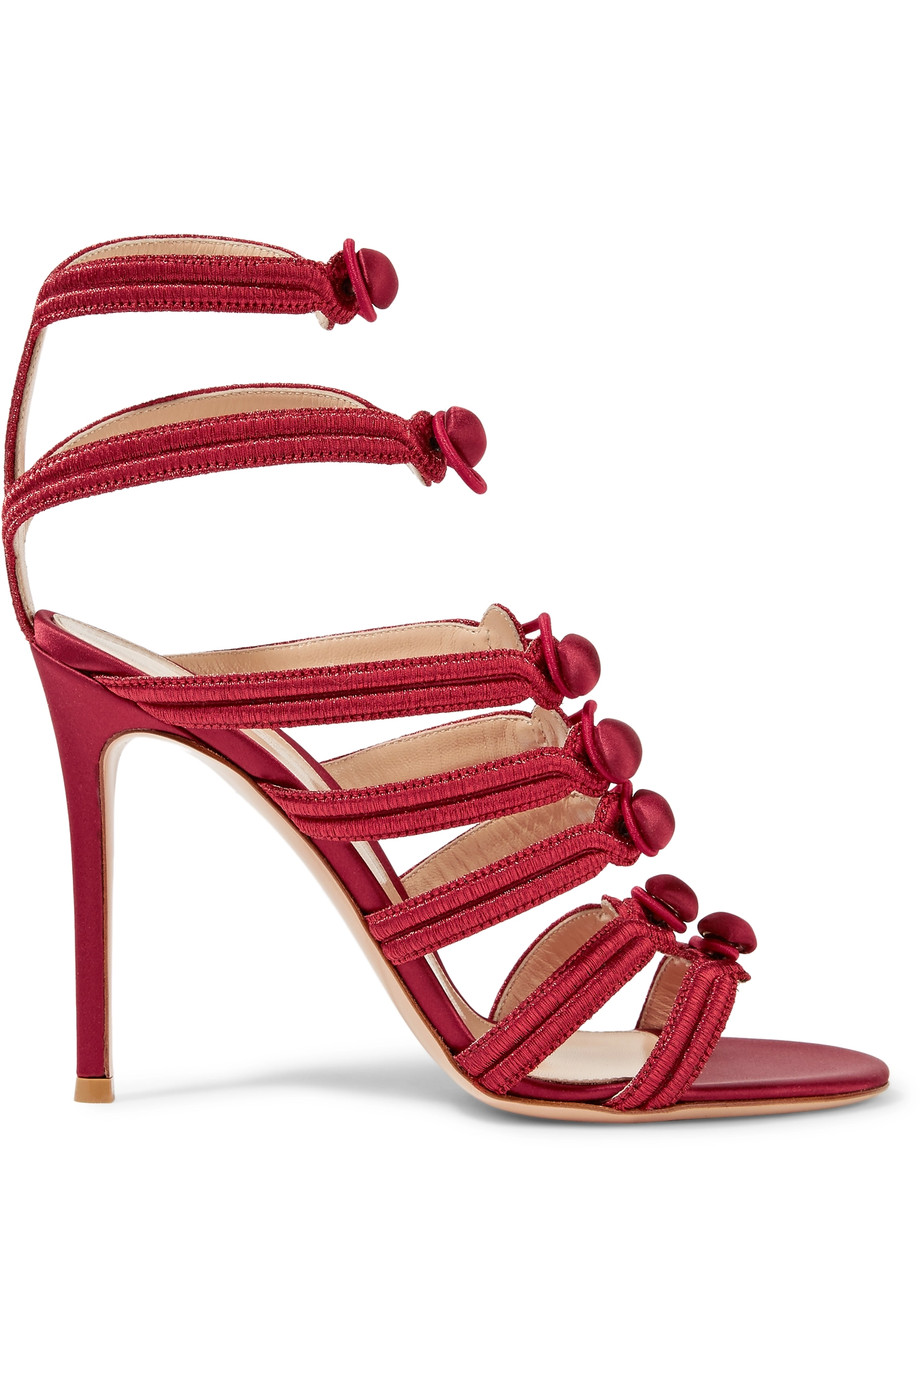 Gianvito Rossi High heels Regalia embroidered satin sandals